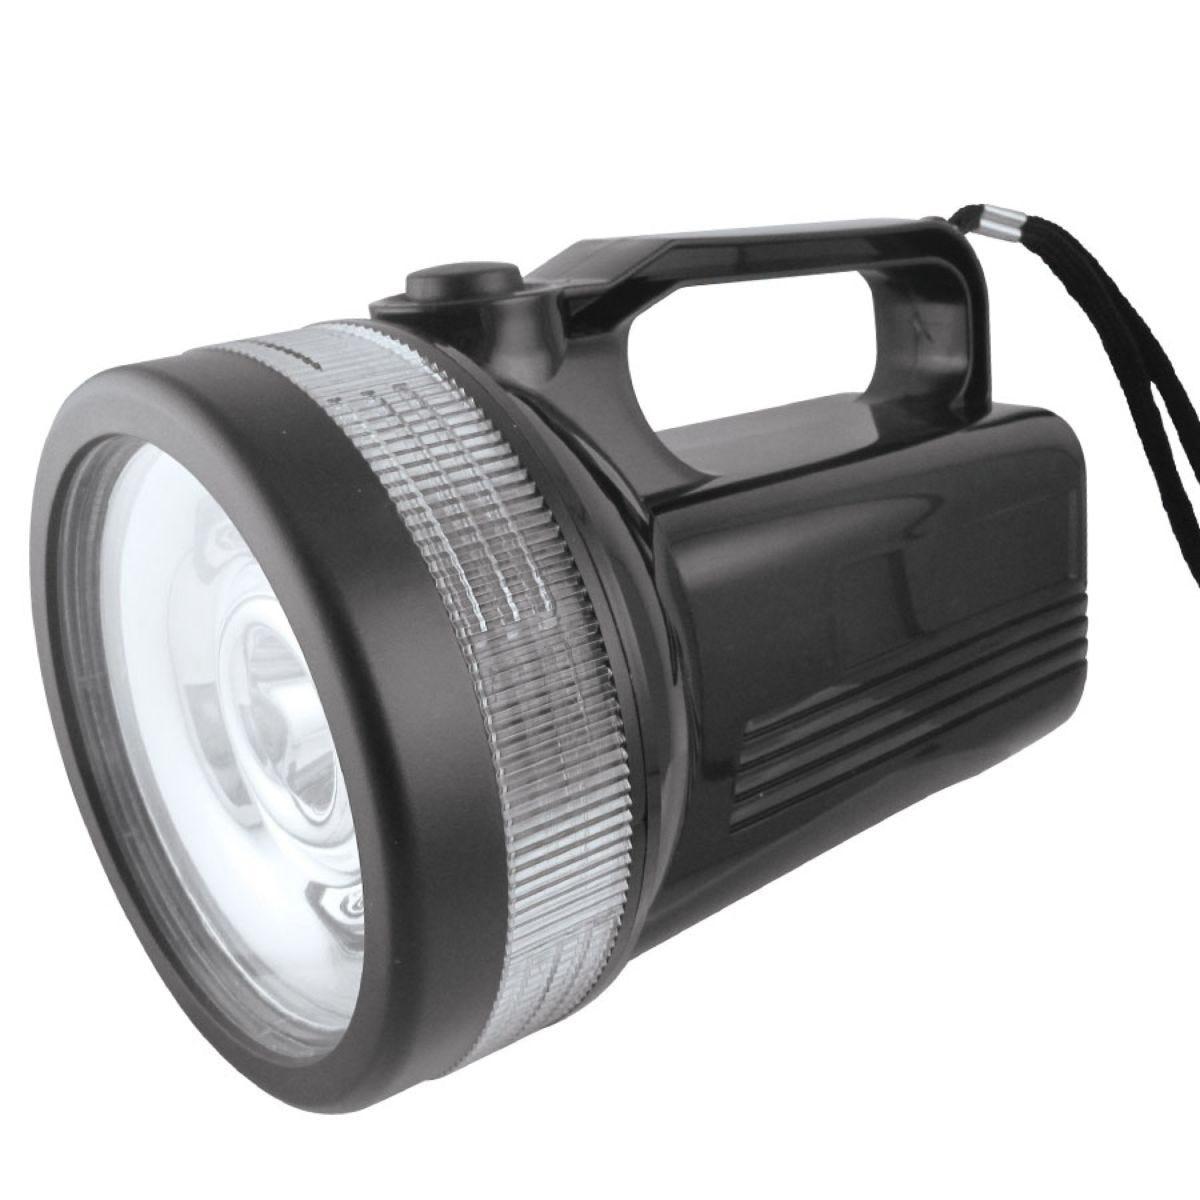 Unicom 1W LED Spotlight with Batteries